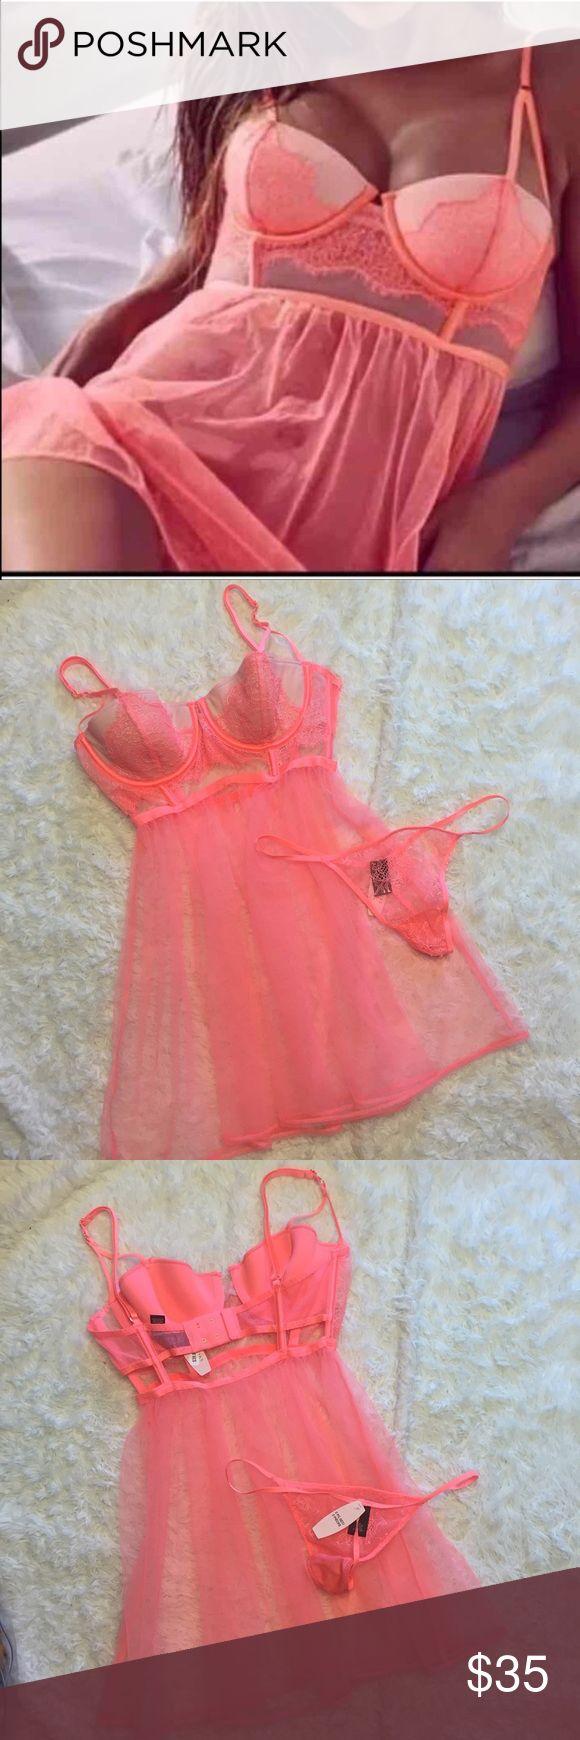 VS Coral Babydoll 34B Small Panty Lightly padded bra Victoria's Secret Intimates & Sleepwear